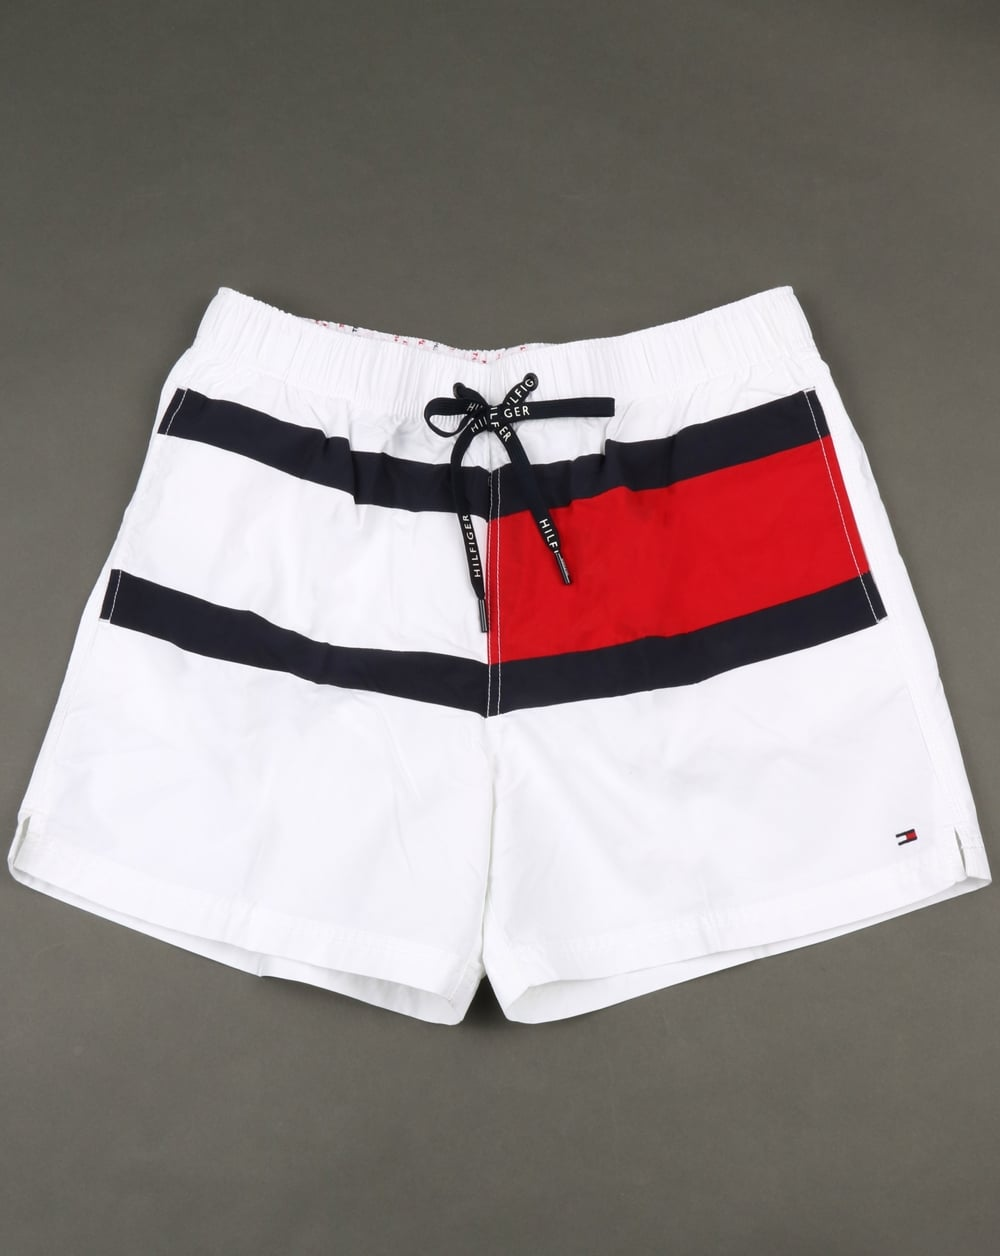 b1cac15019 Tommy Hilfiger Flag Swim Shorts Bright White,beach,swimmers,holiday